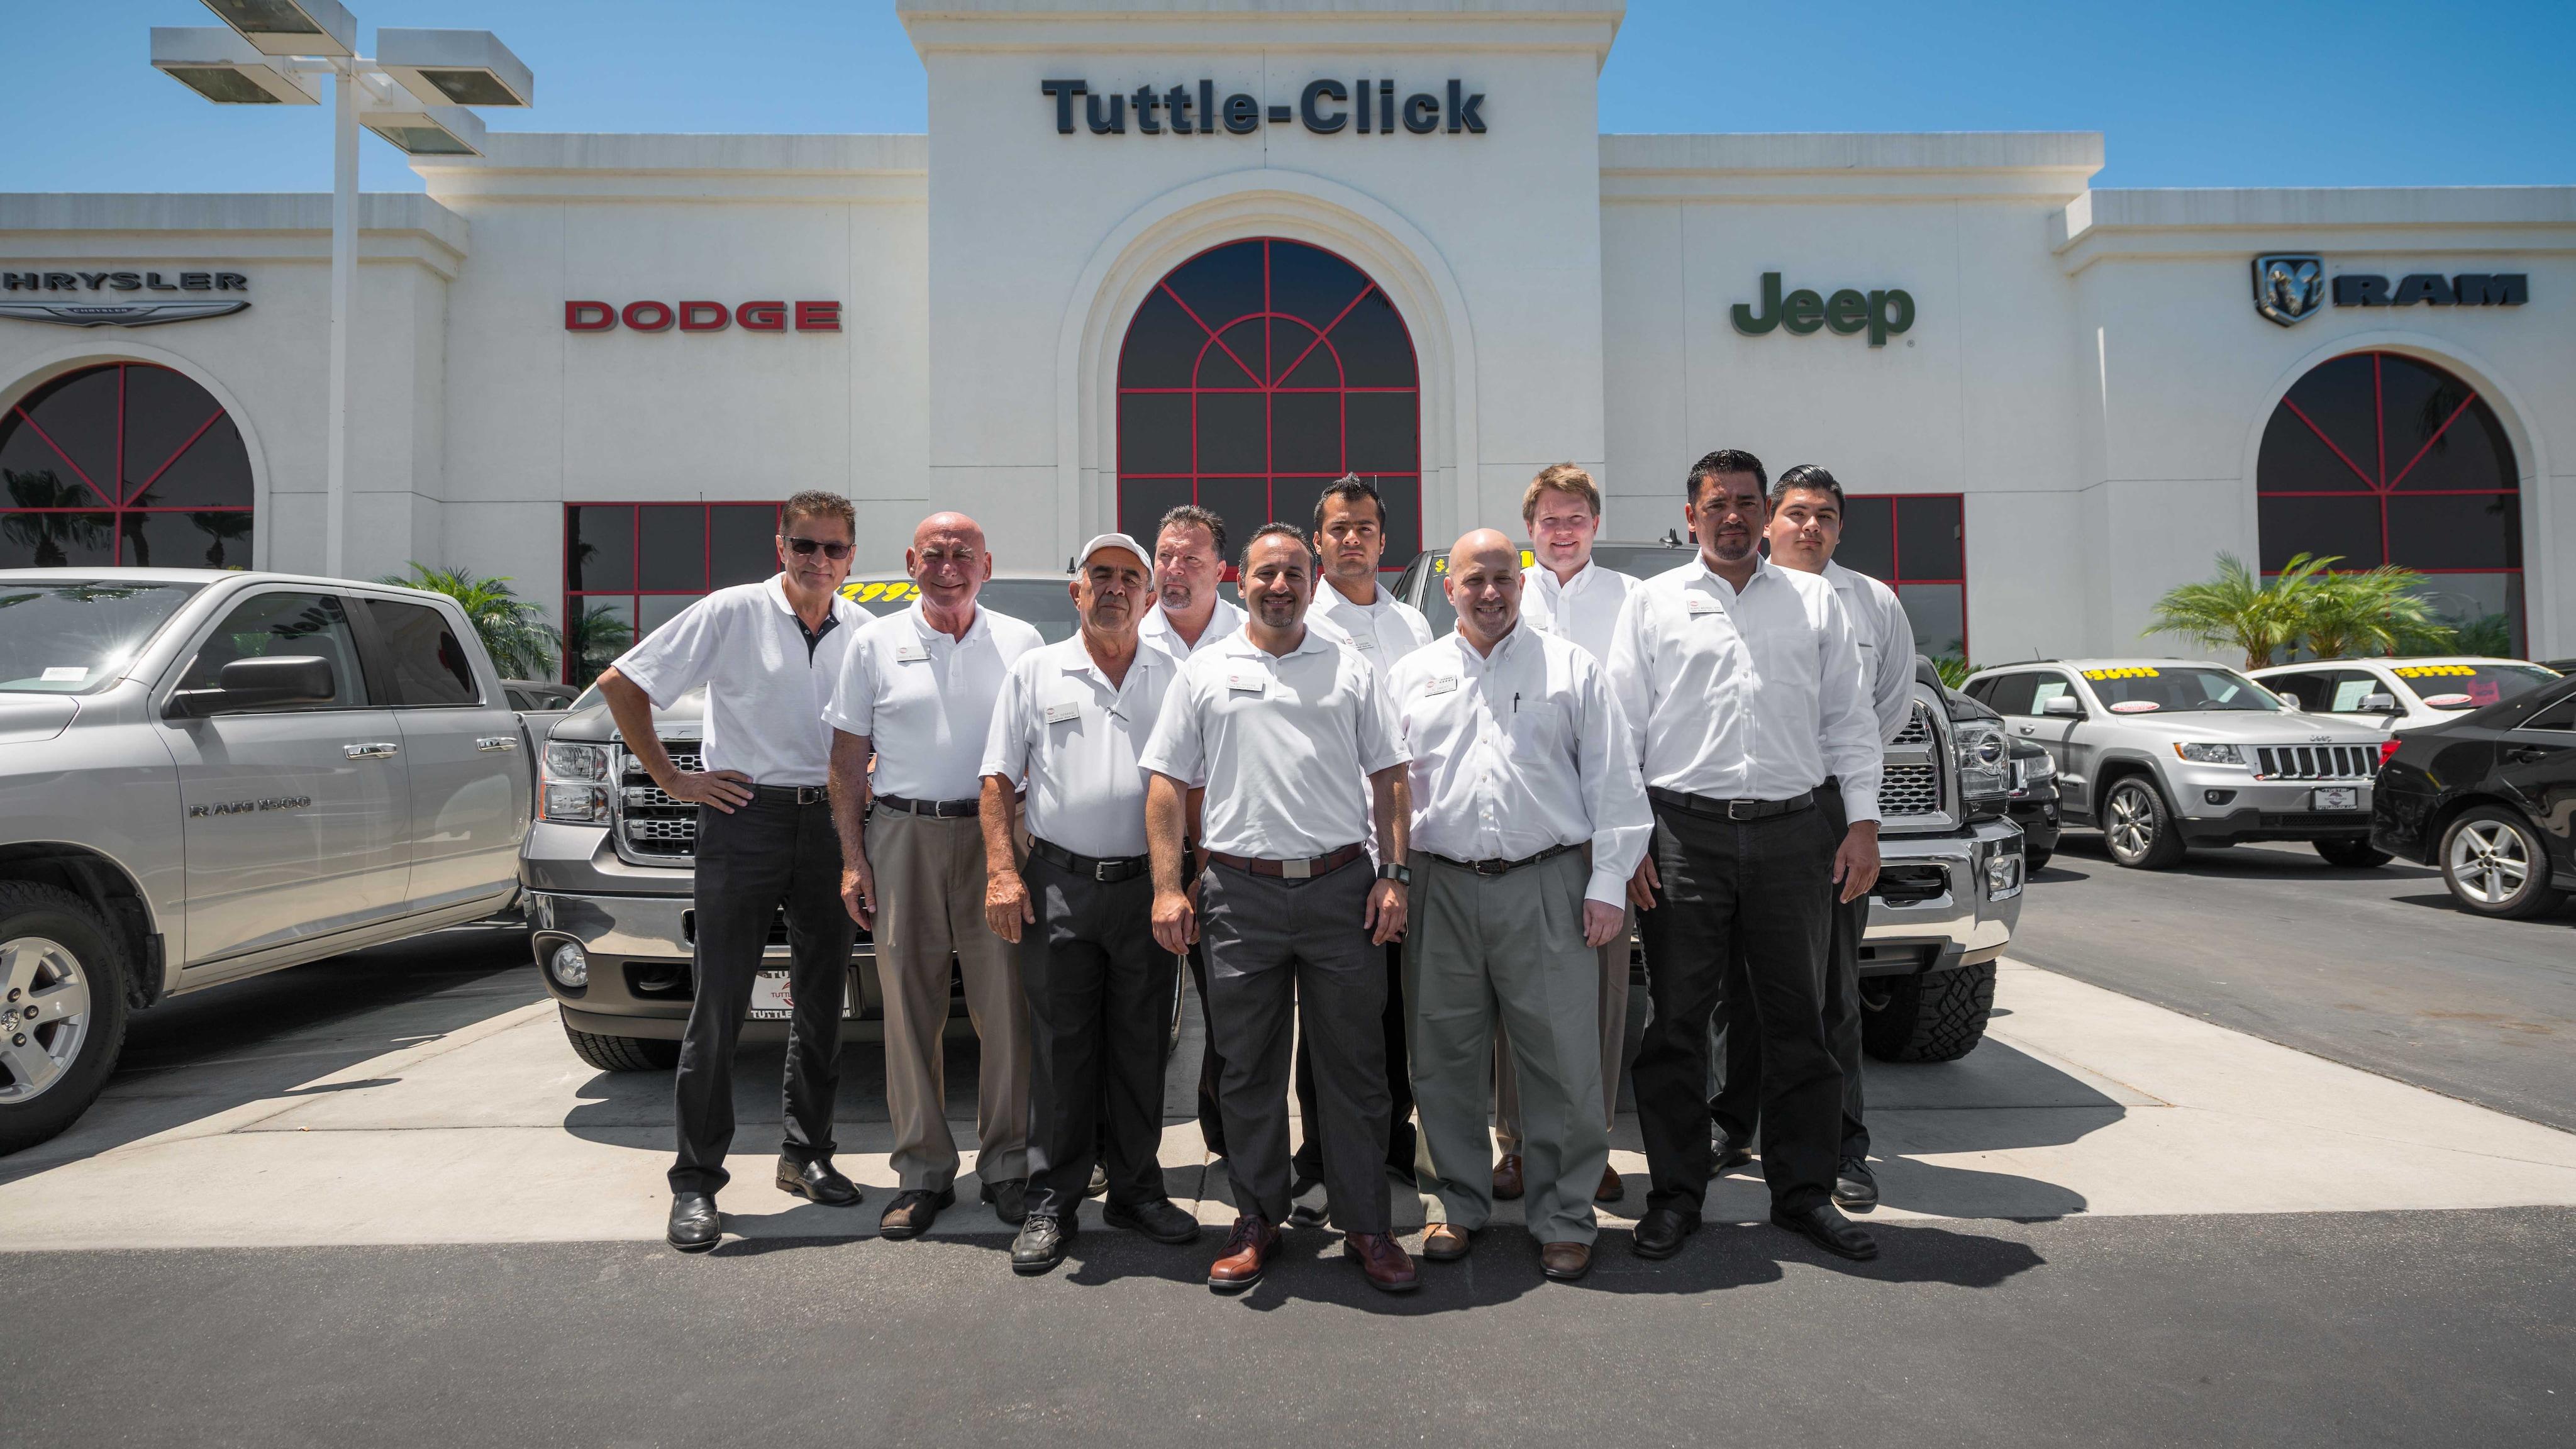 Tustin Chrysler Jeep Dodge >> Tuttle-Click's Tustin Chrysler Jeep Dodge Ram | New Chrysler, Dodge, Jeep, Ram dealership in ...